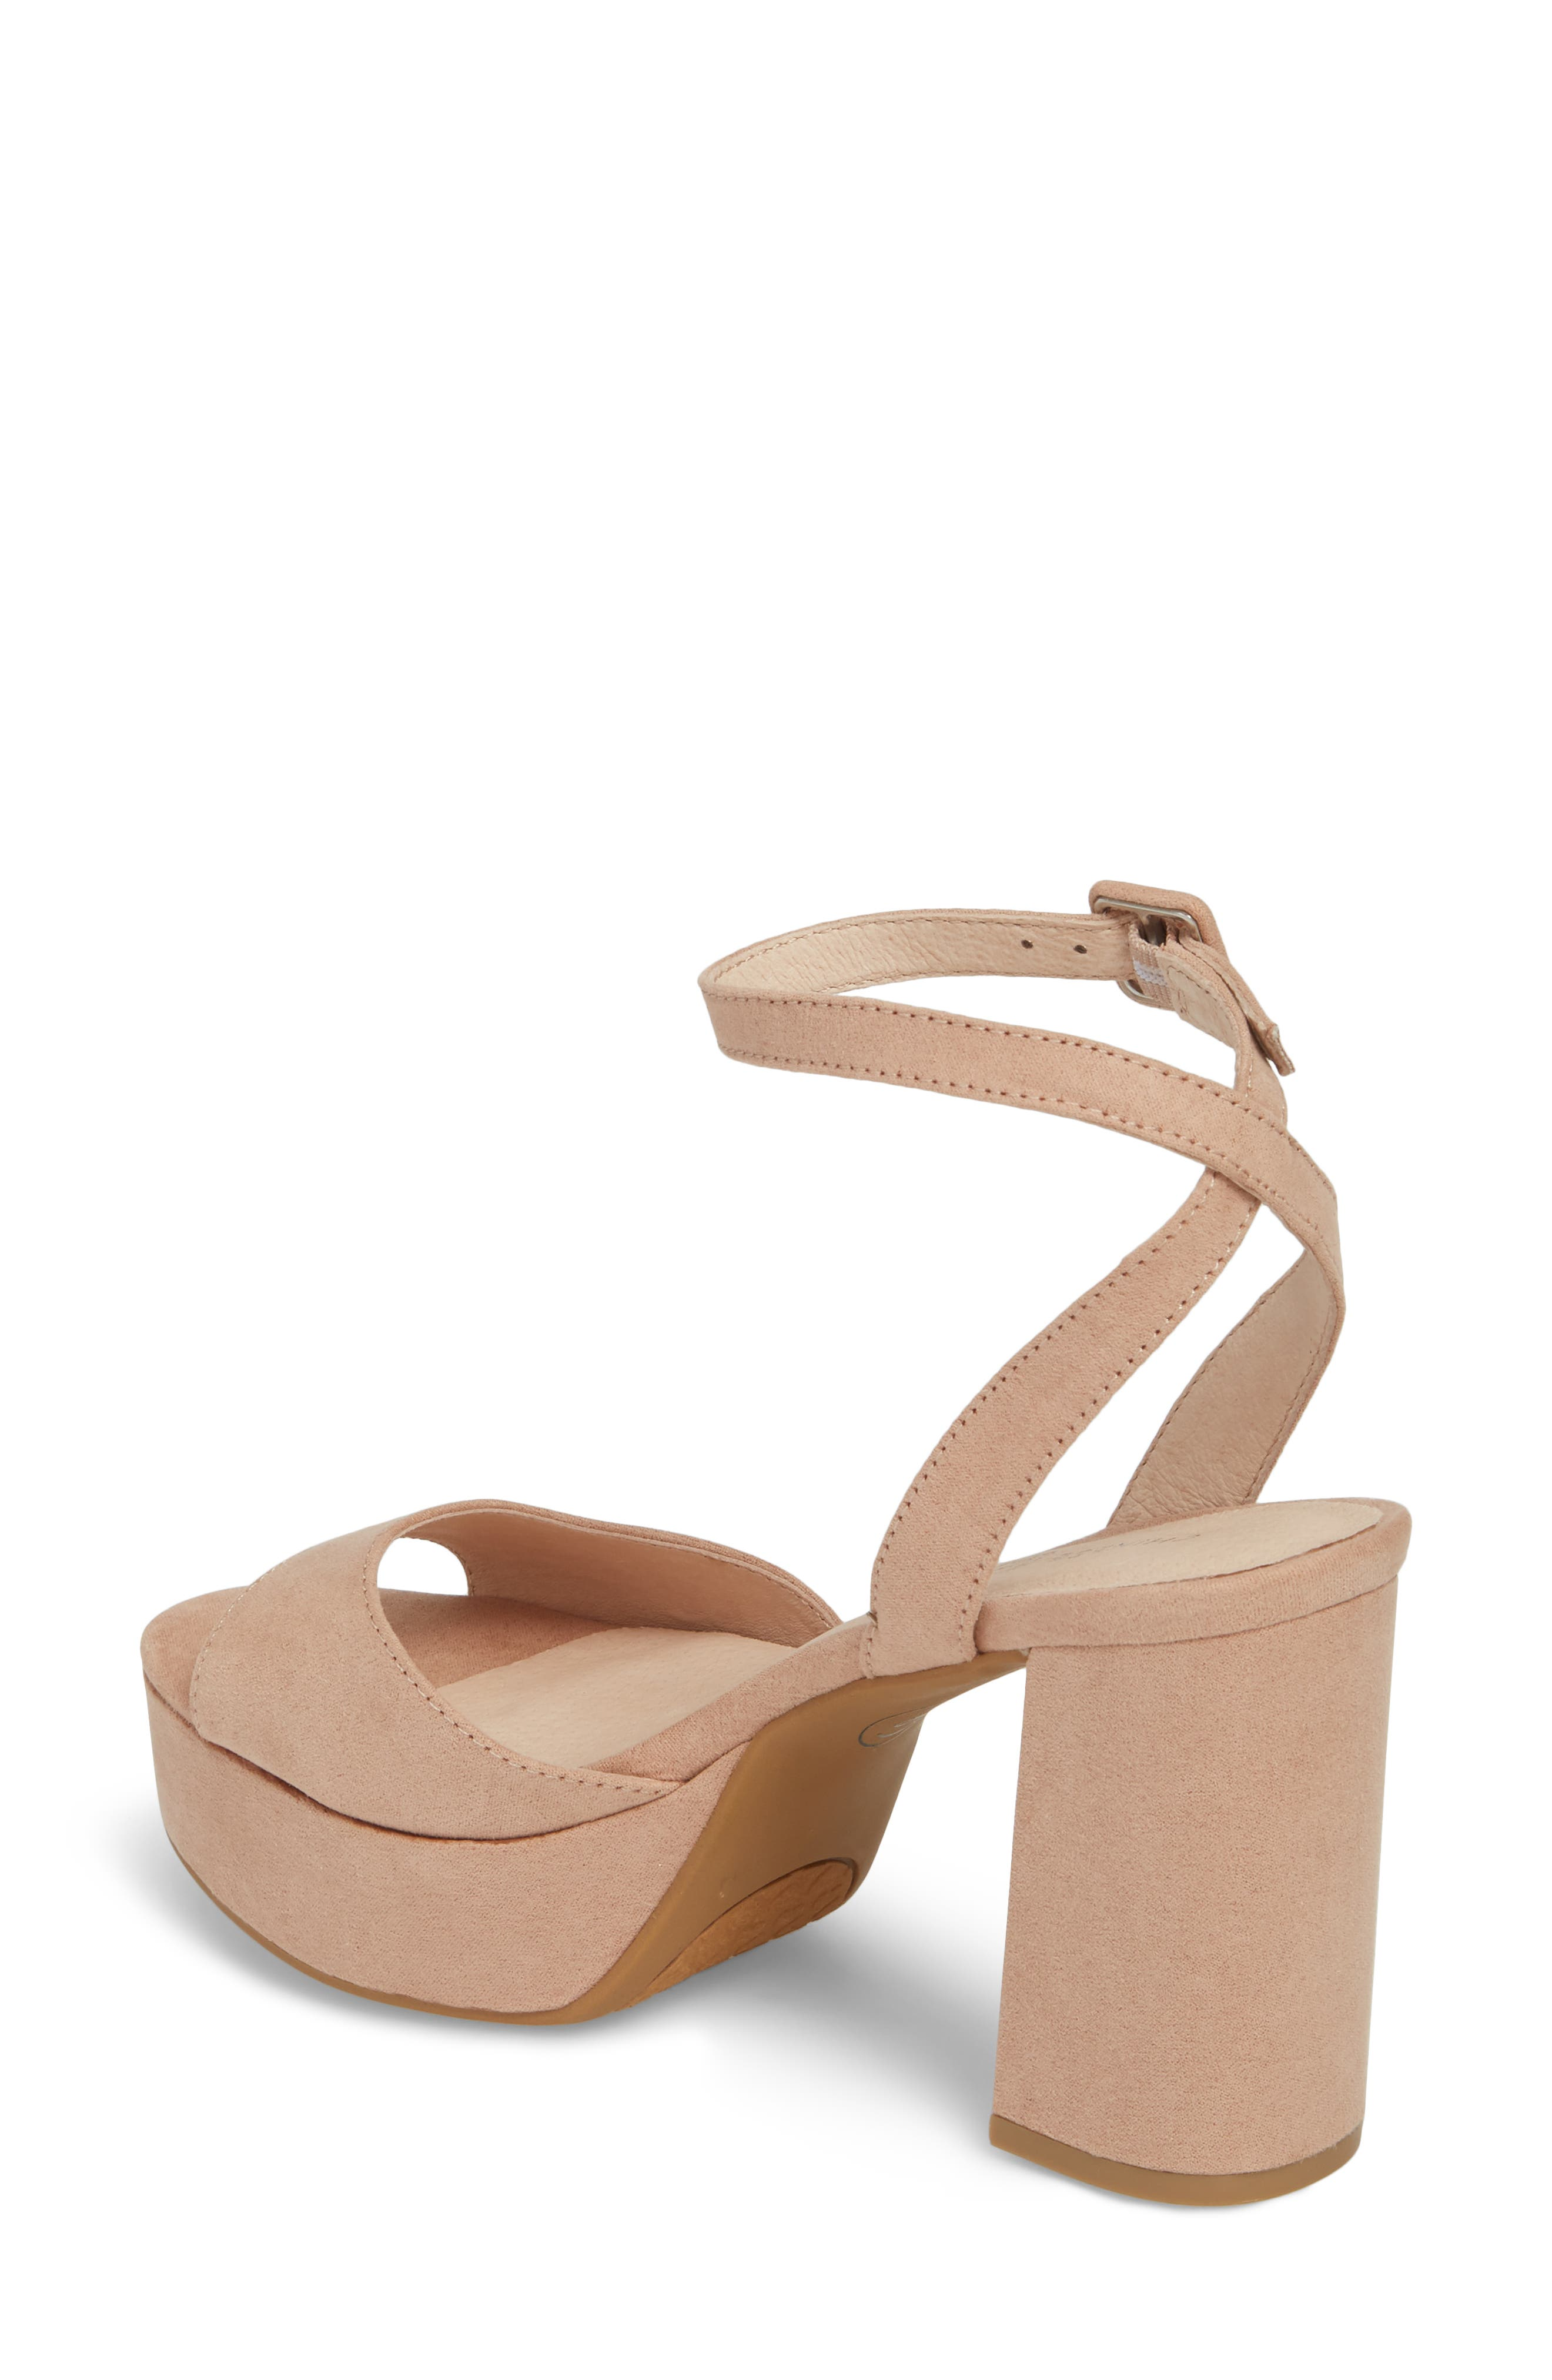 Theresa Platform Sandal,                             Alternate thumbnail 2, color,                             Dark Nude